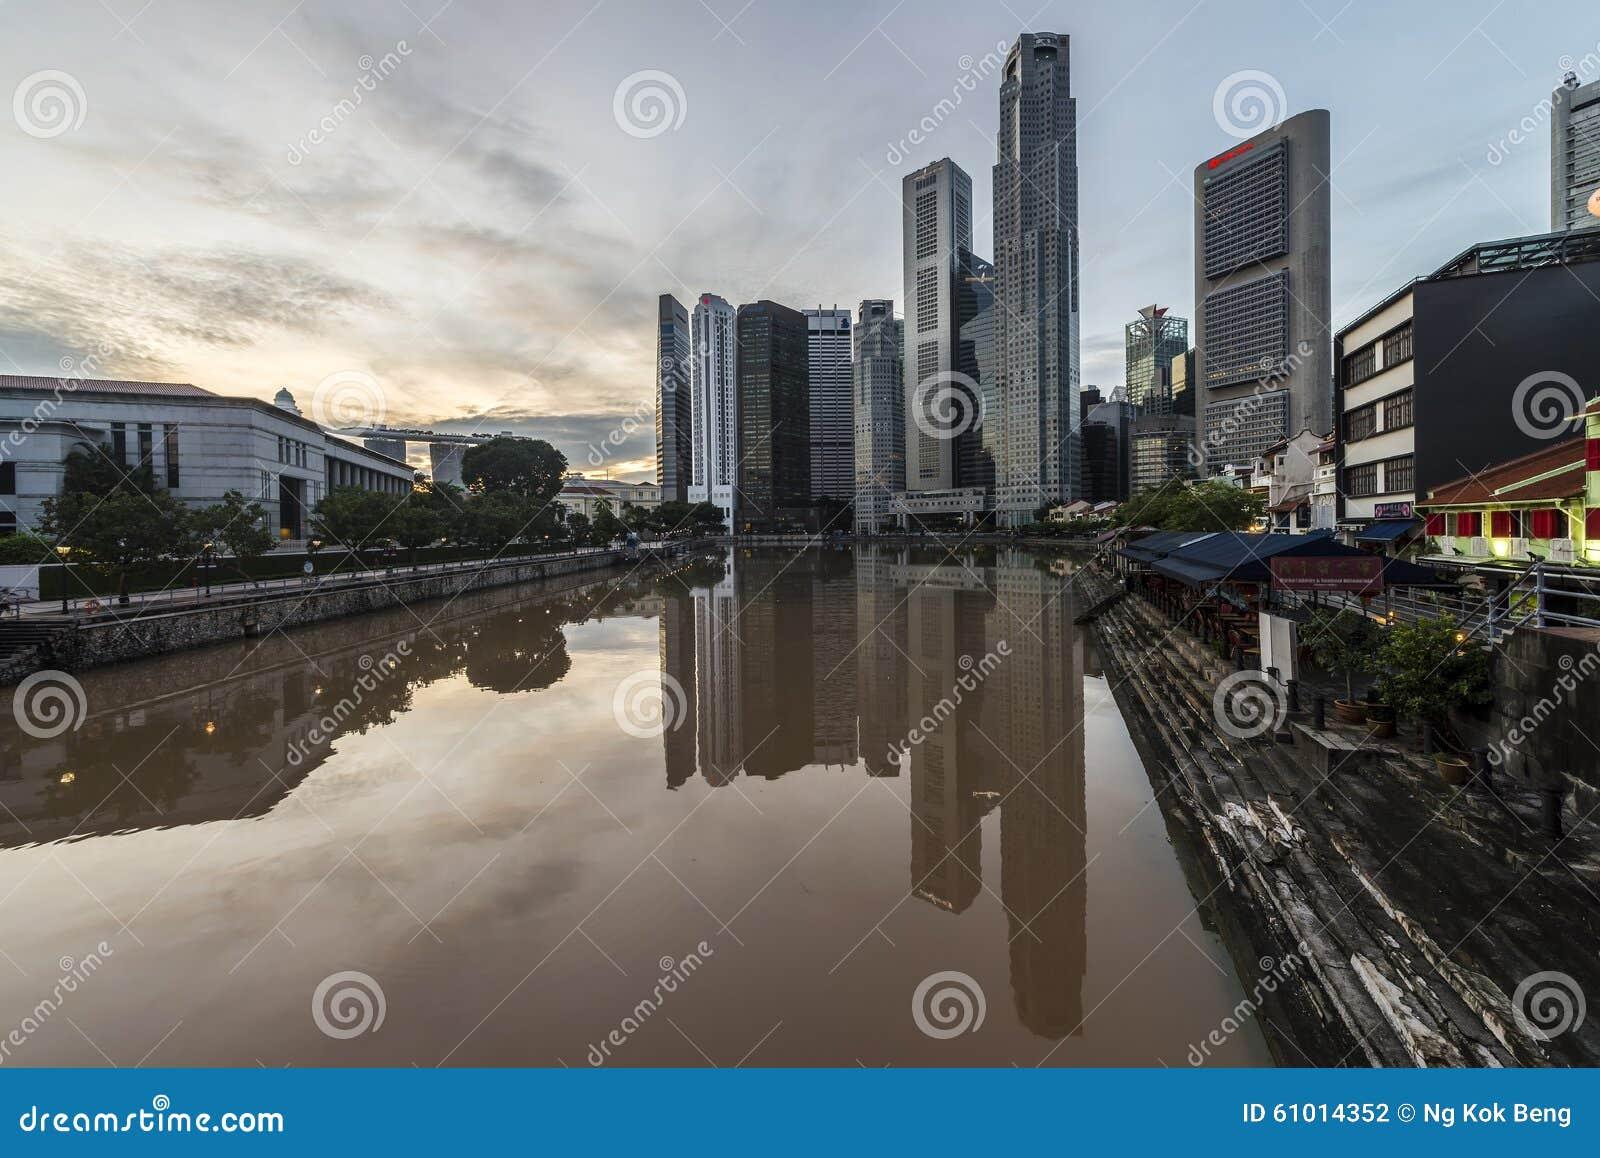 Bootkade in Loterijenplaats, Singapore